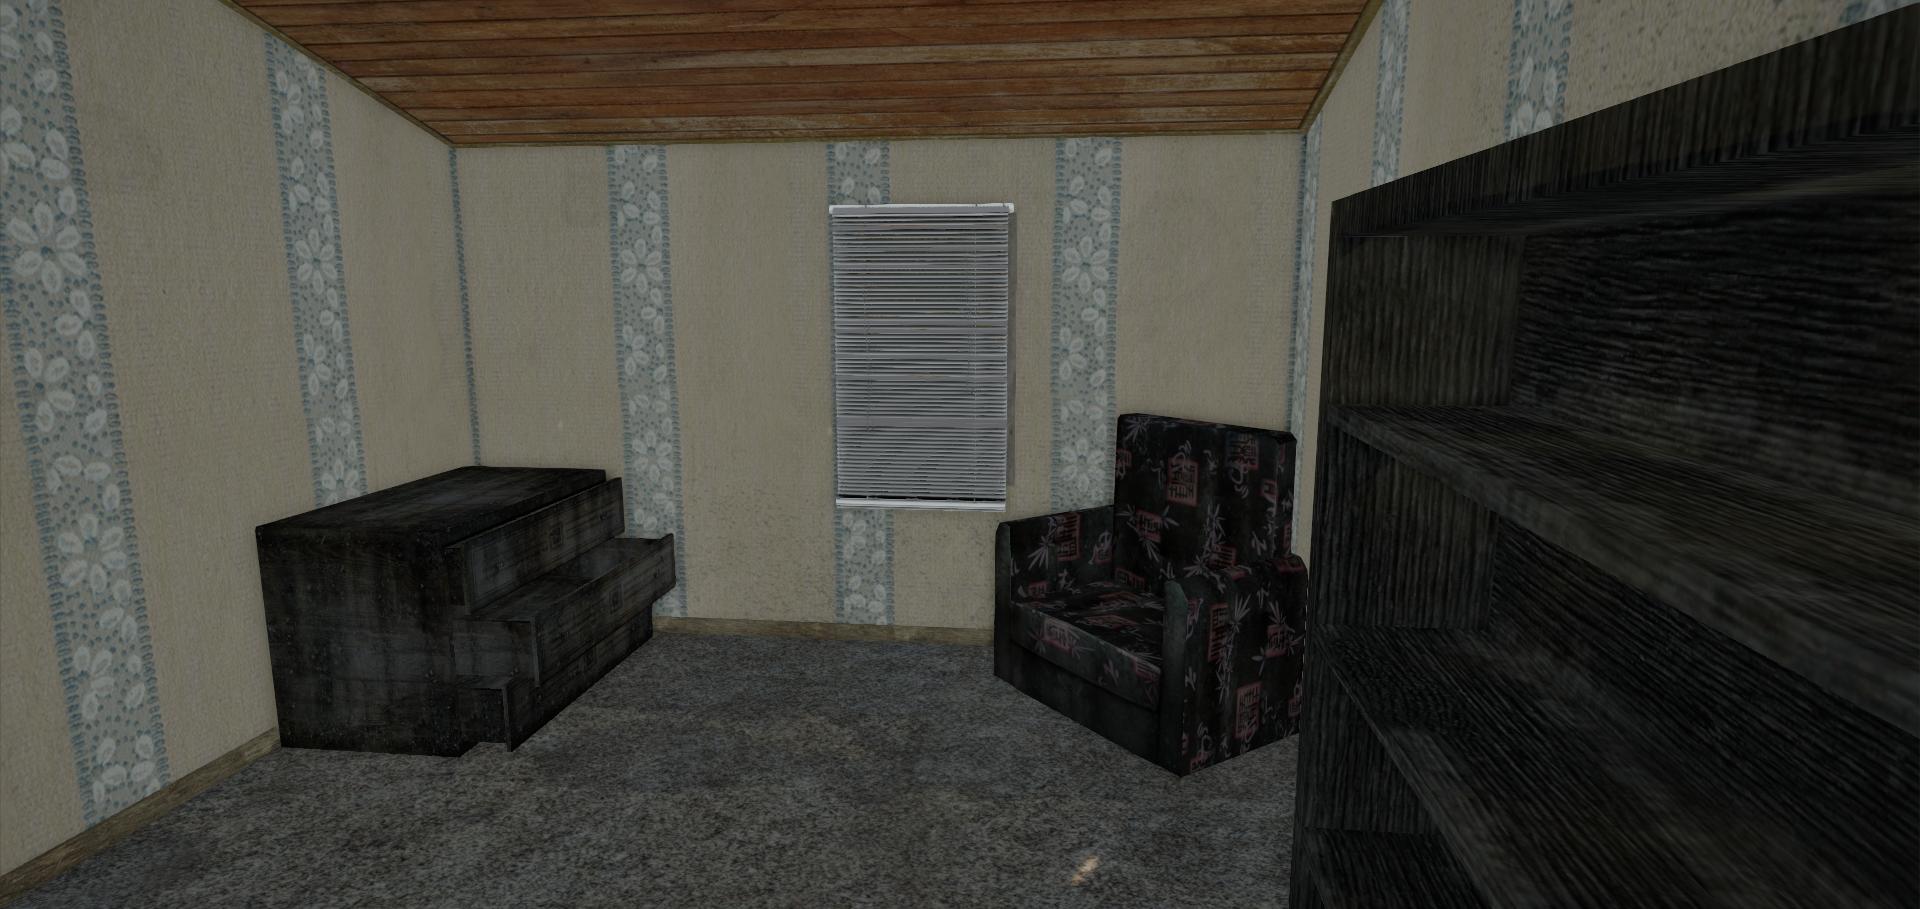 Bedroom 2, before.